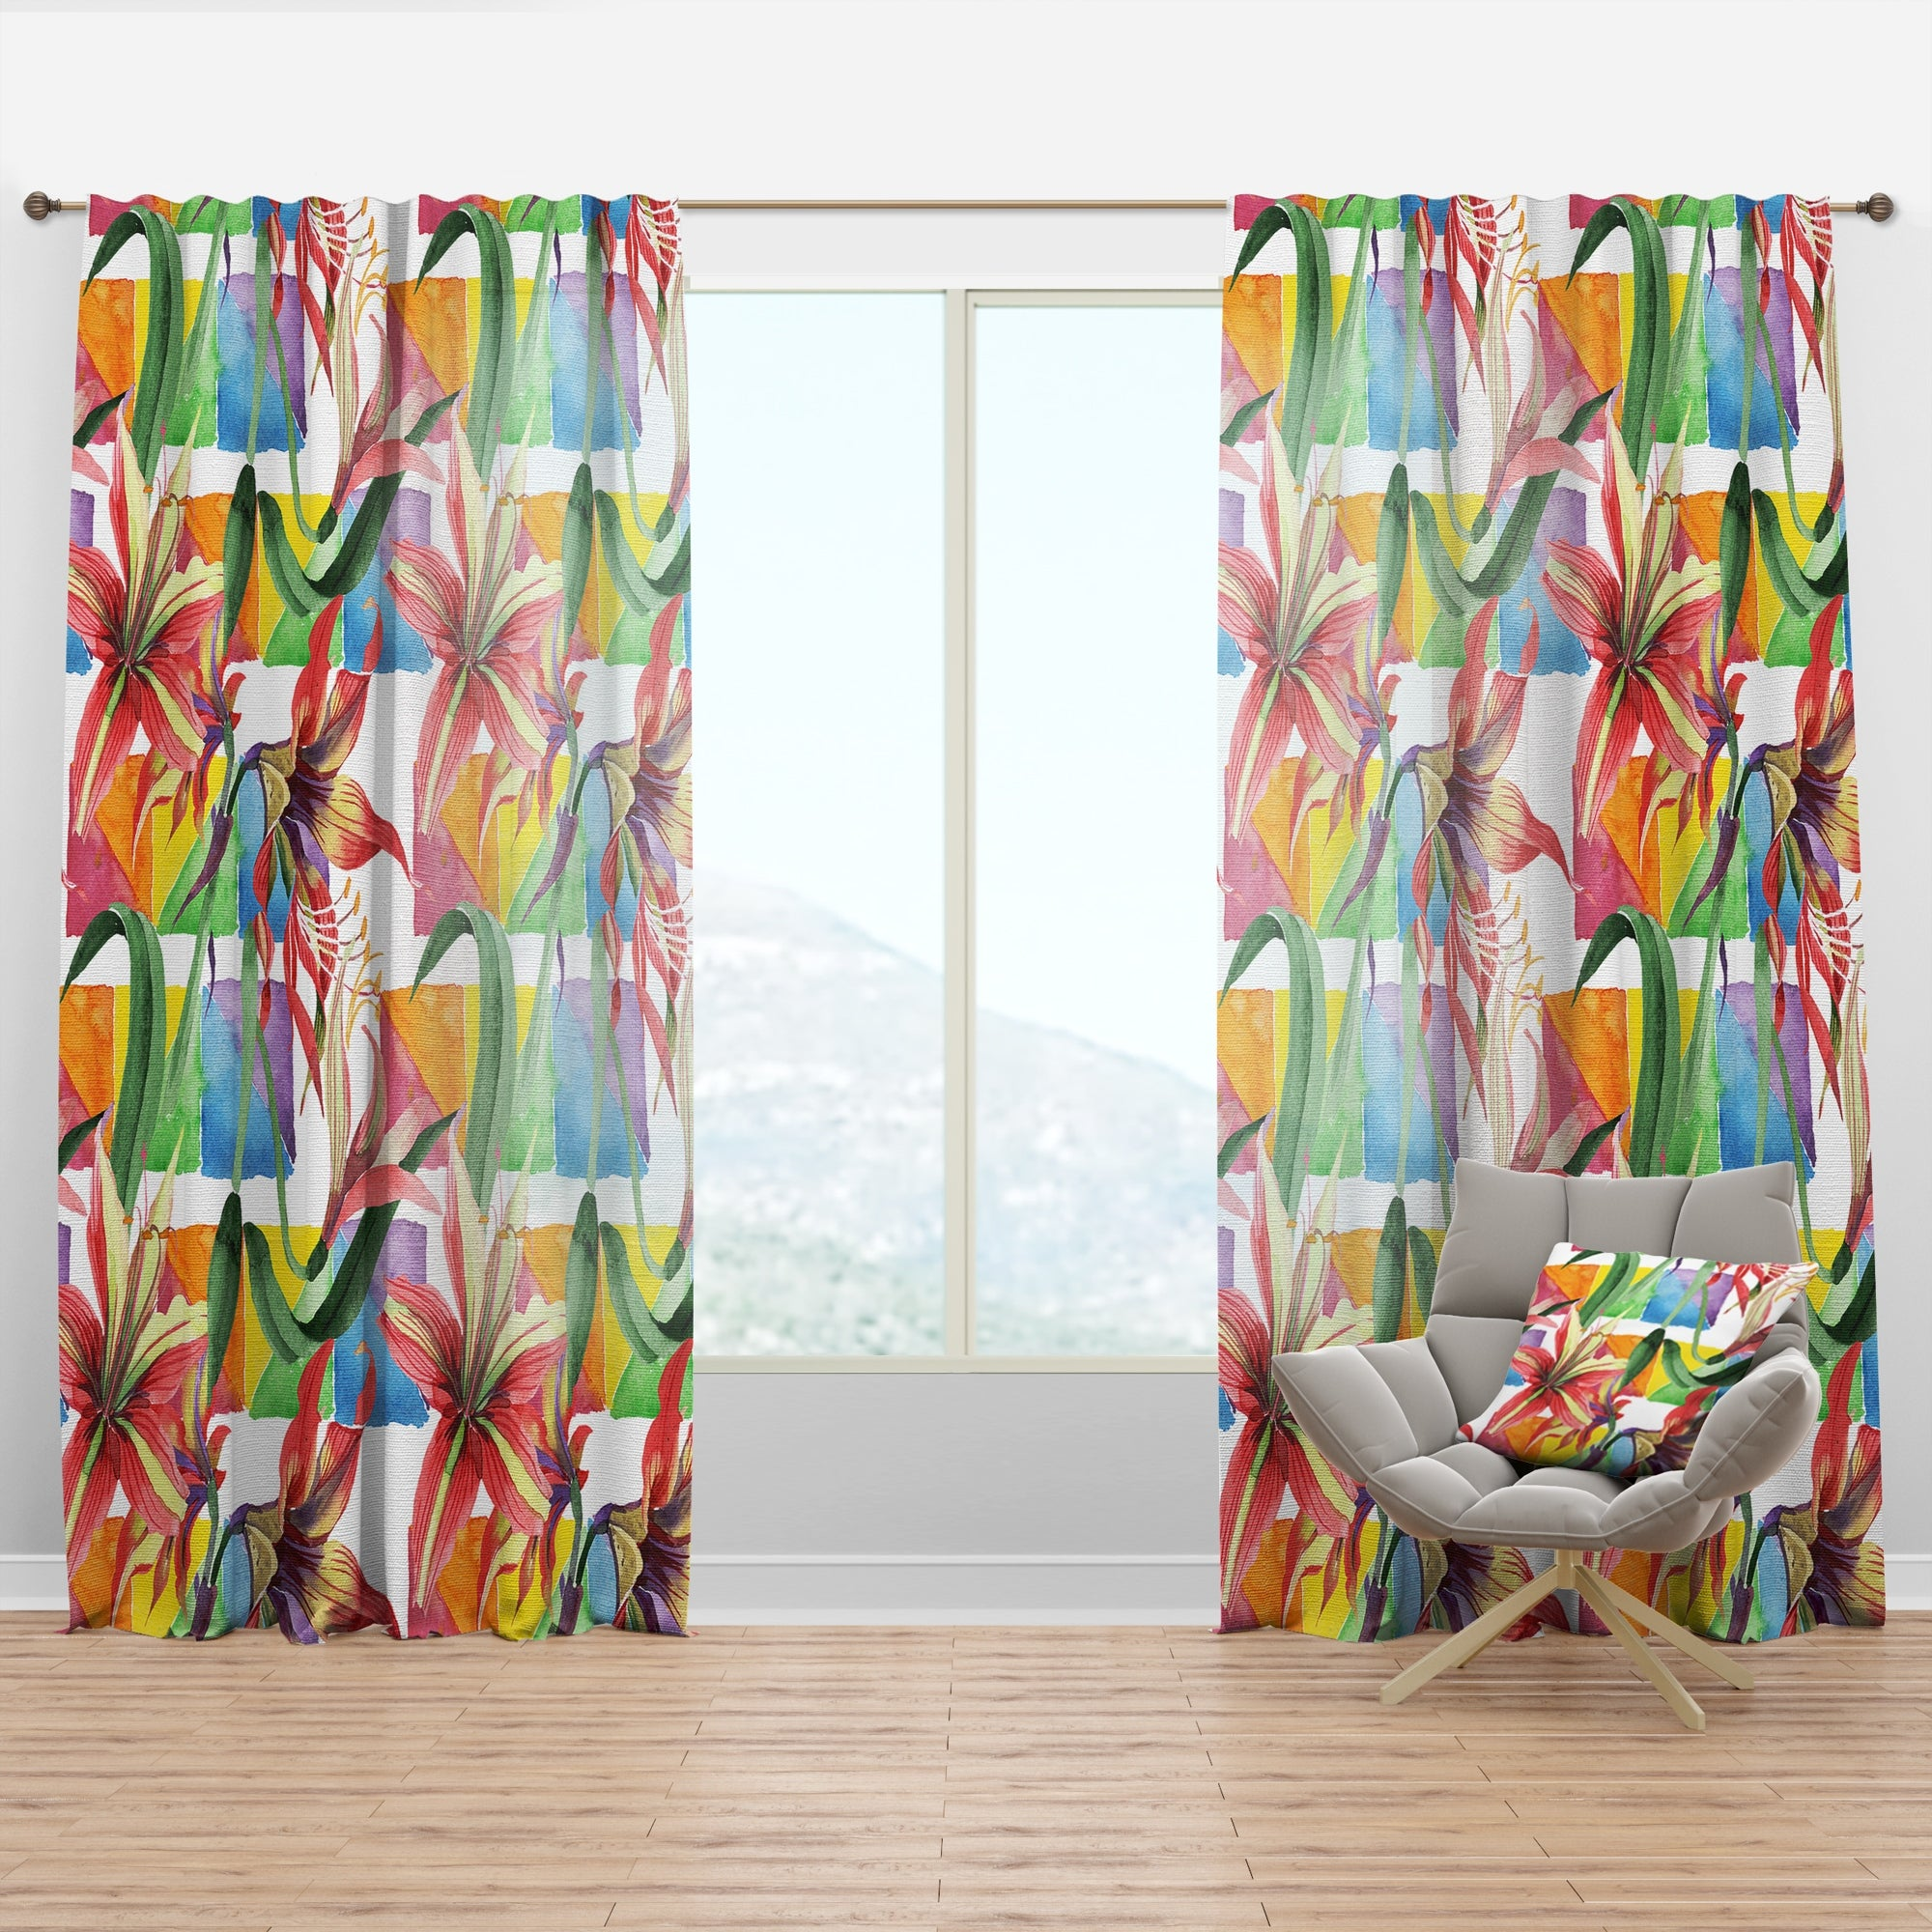 Designart Retro Floral Botanical I Mid Century Modern Curtain Panel On Sale Overstock 29625909